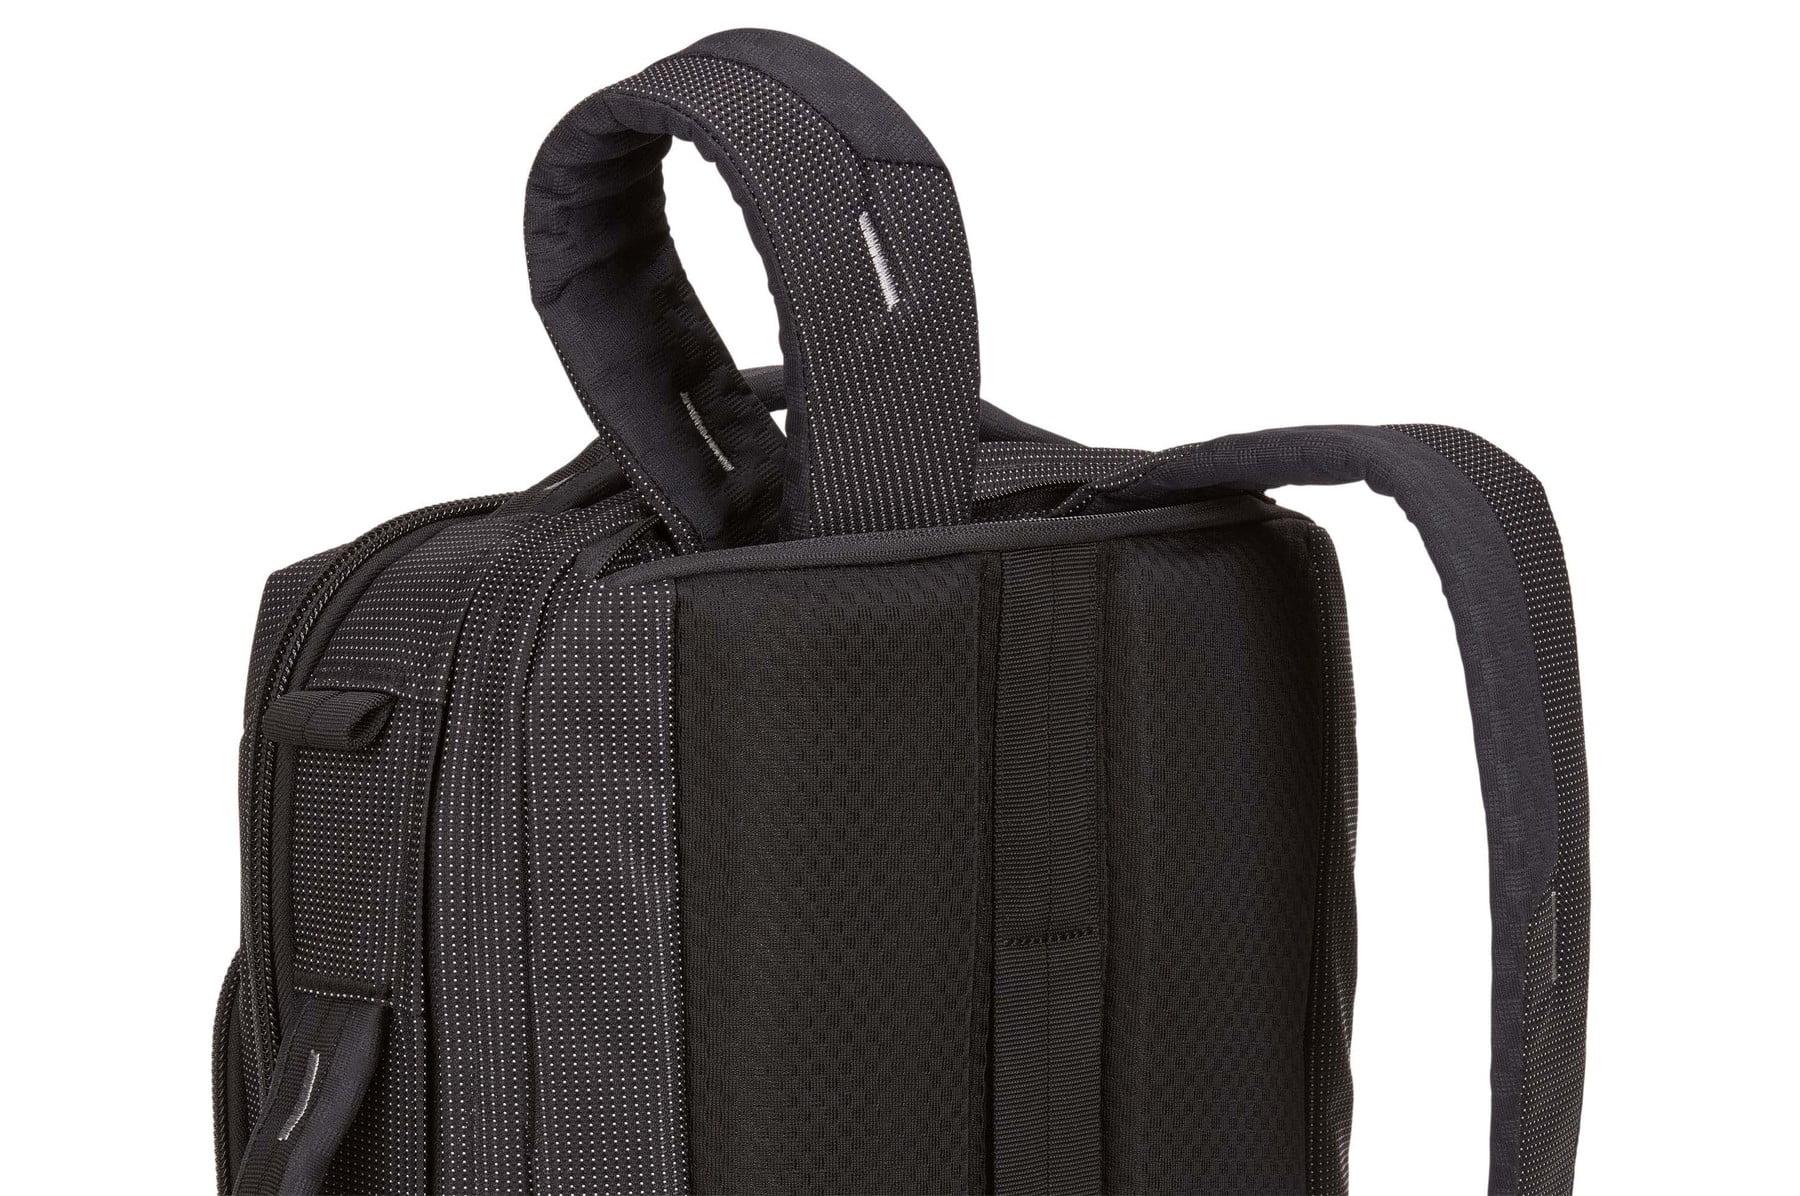 Geanta laptop Thule Crossover 2 Convertible Laptop Bag 15.6 inchi Black 5